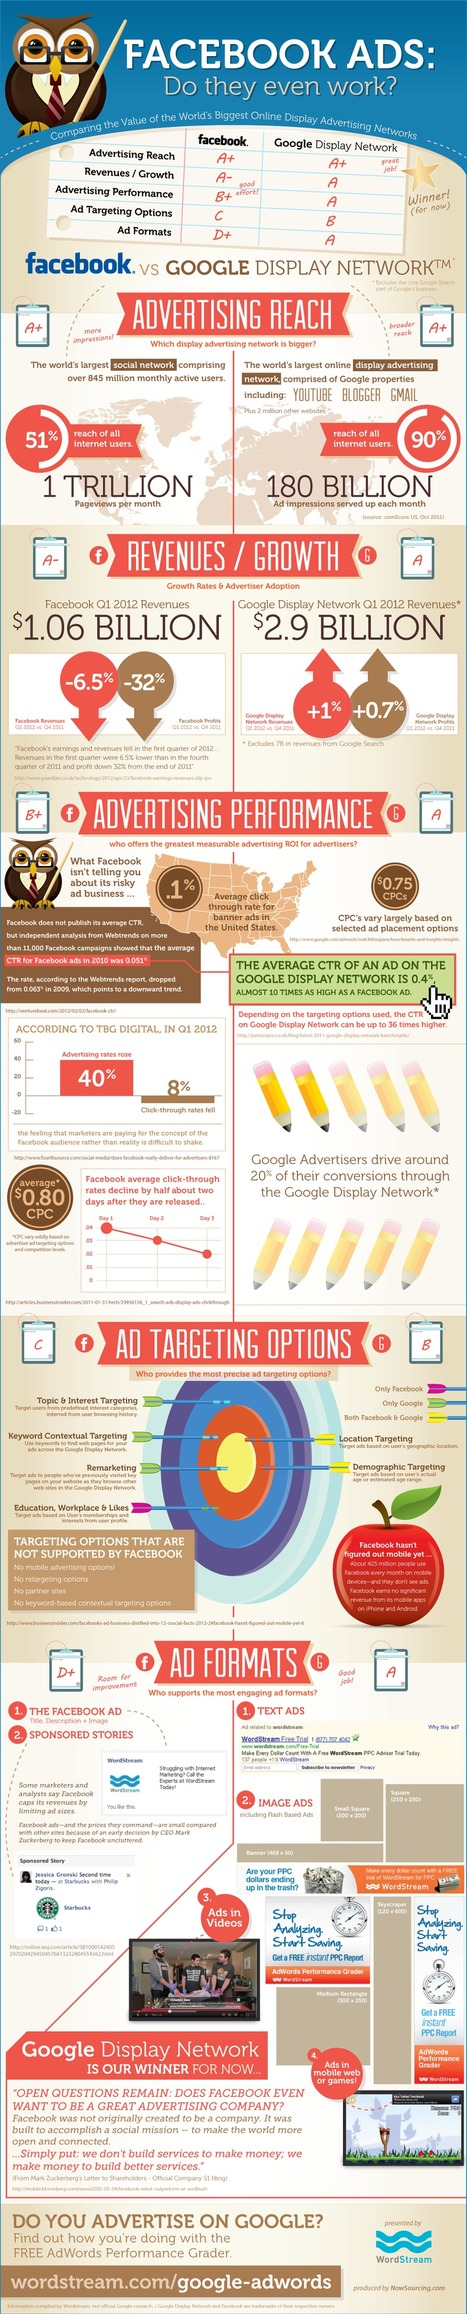 Ads vs Adwords   M.M.E.   Digital marketing & social media   Scoop.it